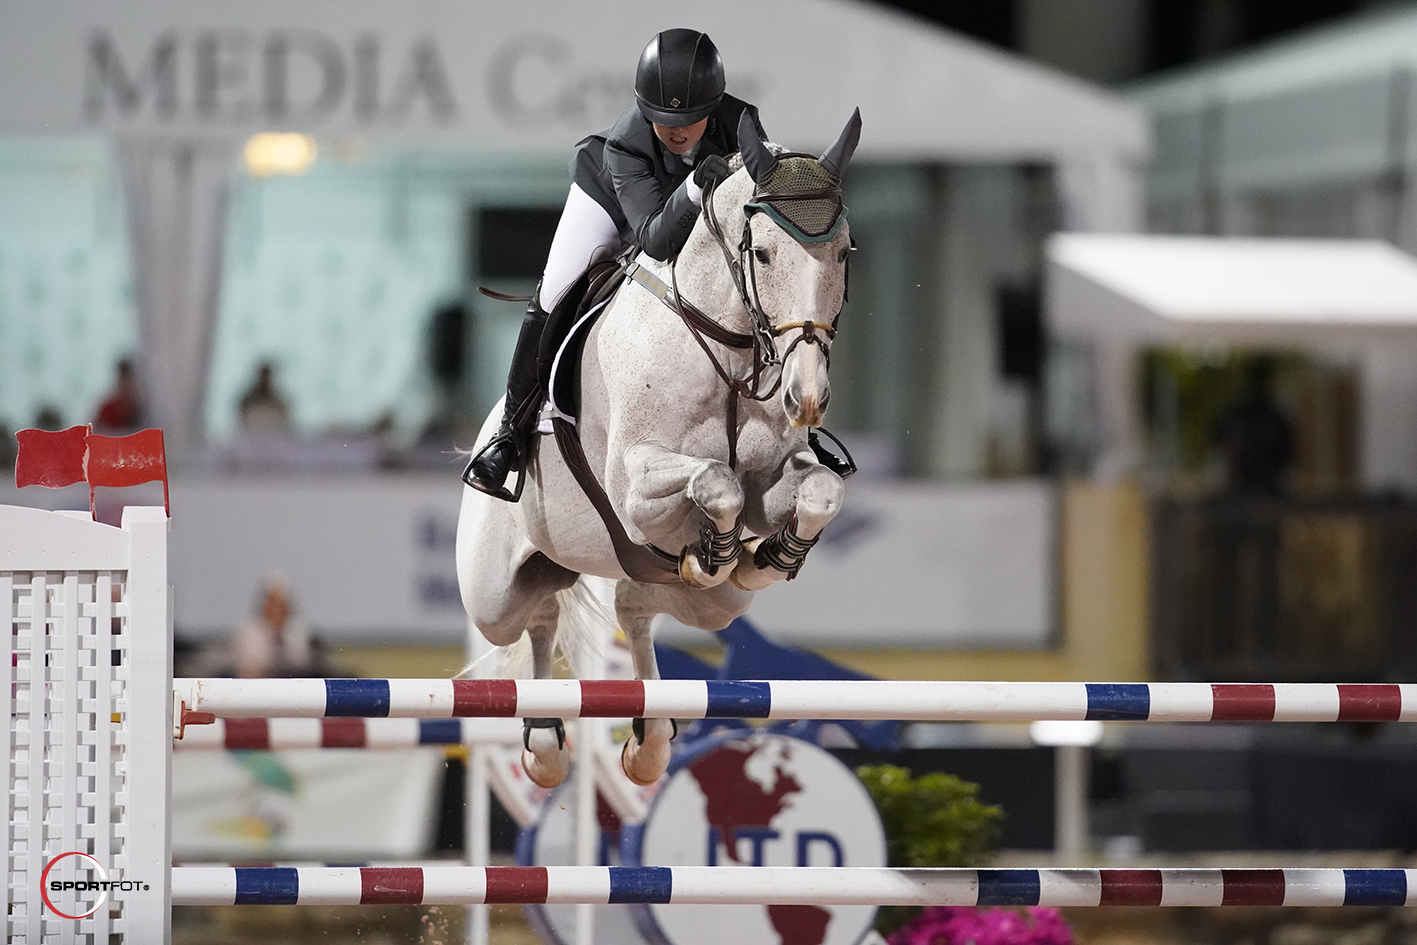 Ailish Cunniffe and Baloucento 314_5089 Sportfot